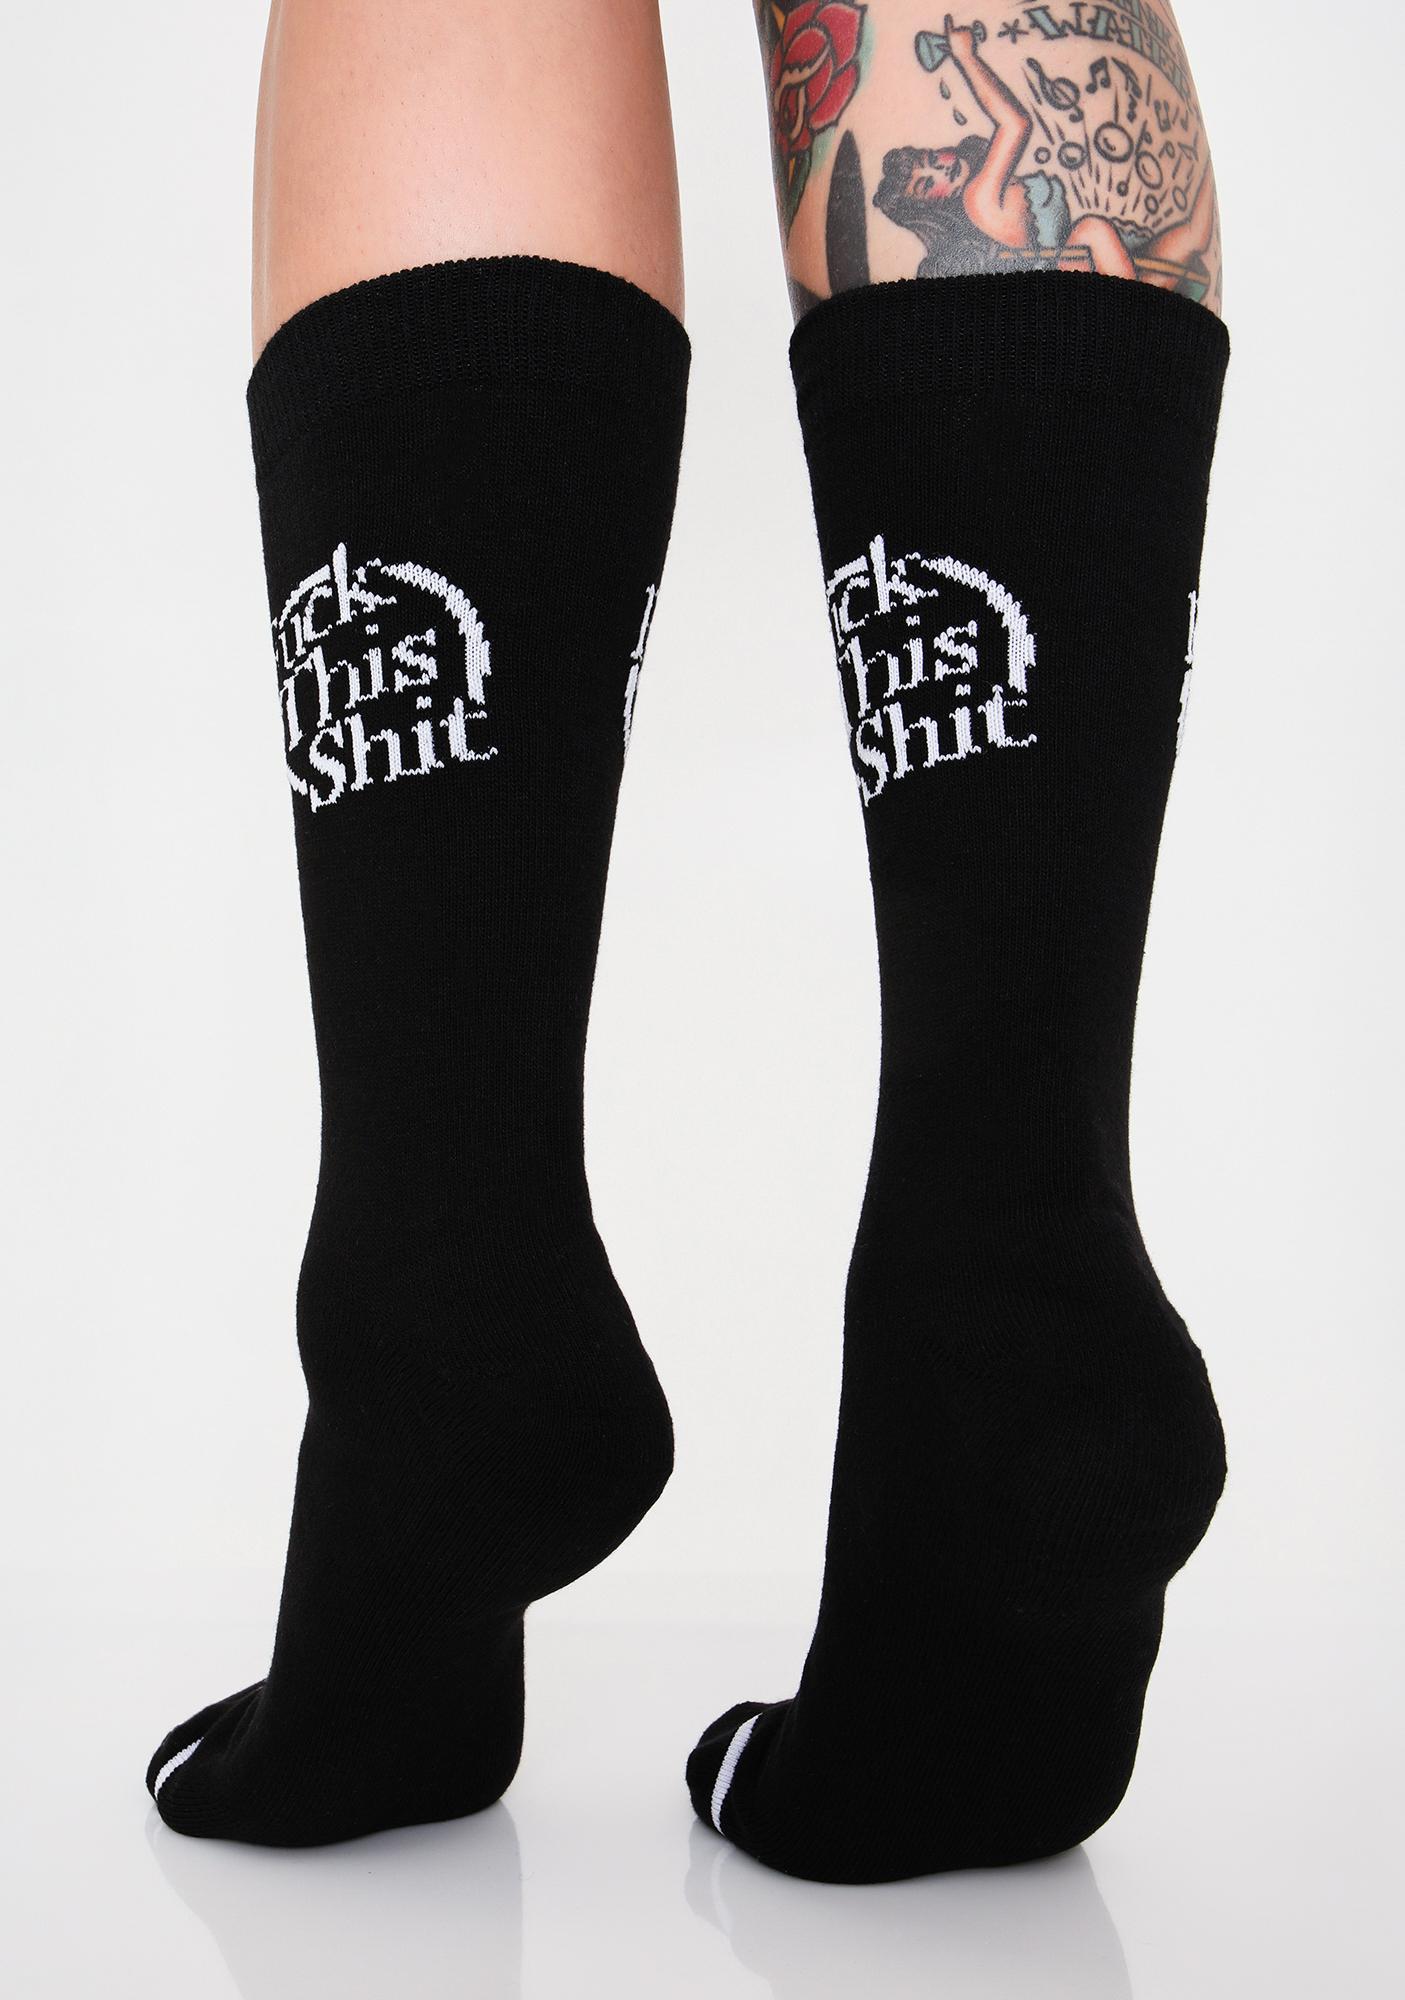 Cool Socks Fukk This Ish Crew Socks